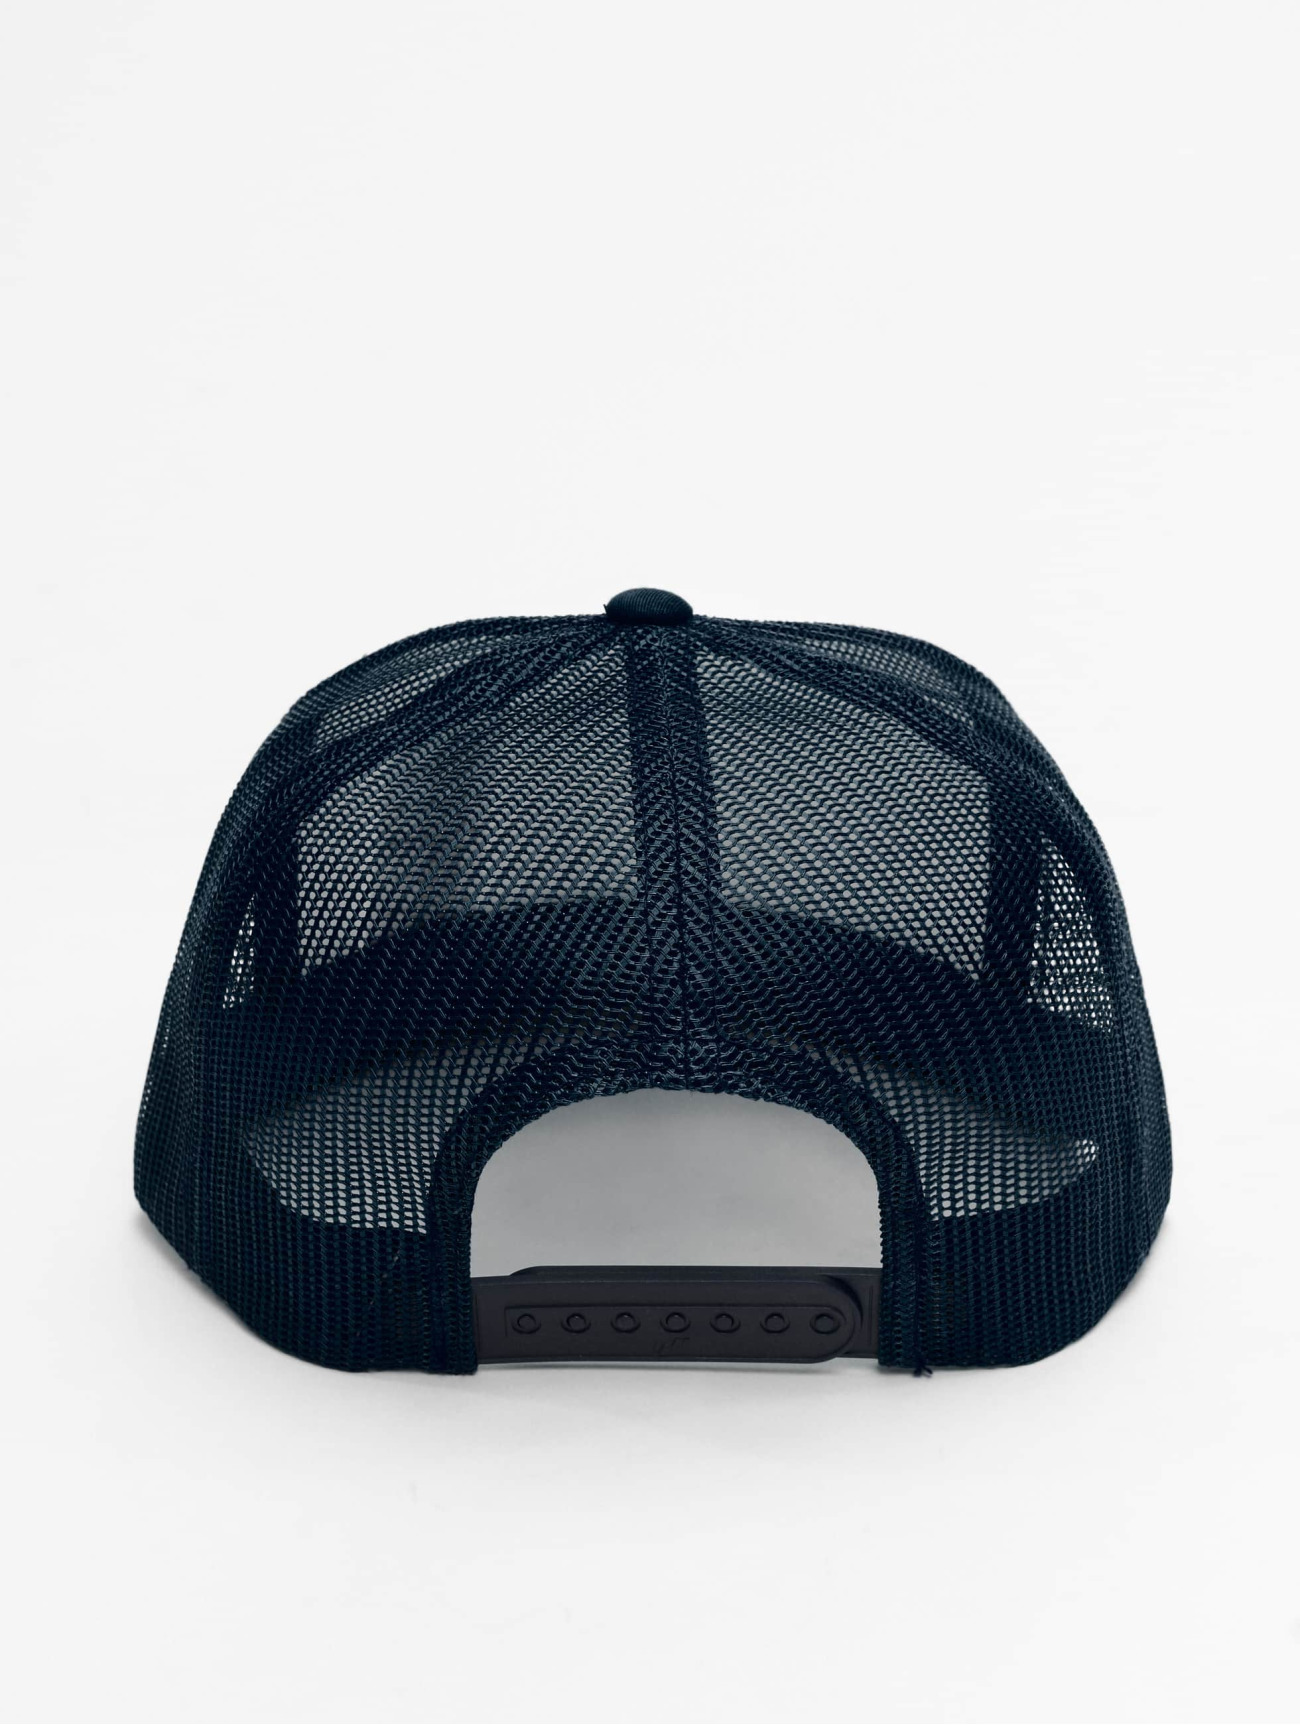 Flexfit  UC6006  bleu  Casquette Trucker mesh  128748 Homme Casquettes